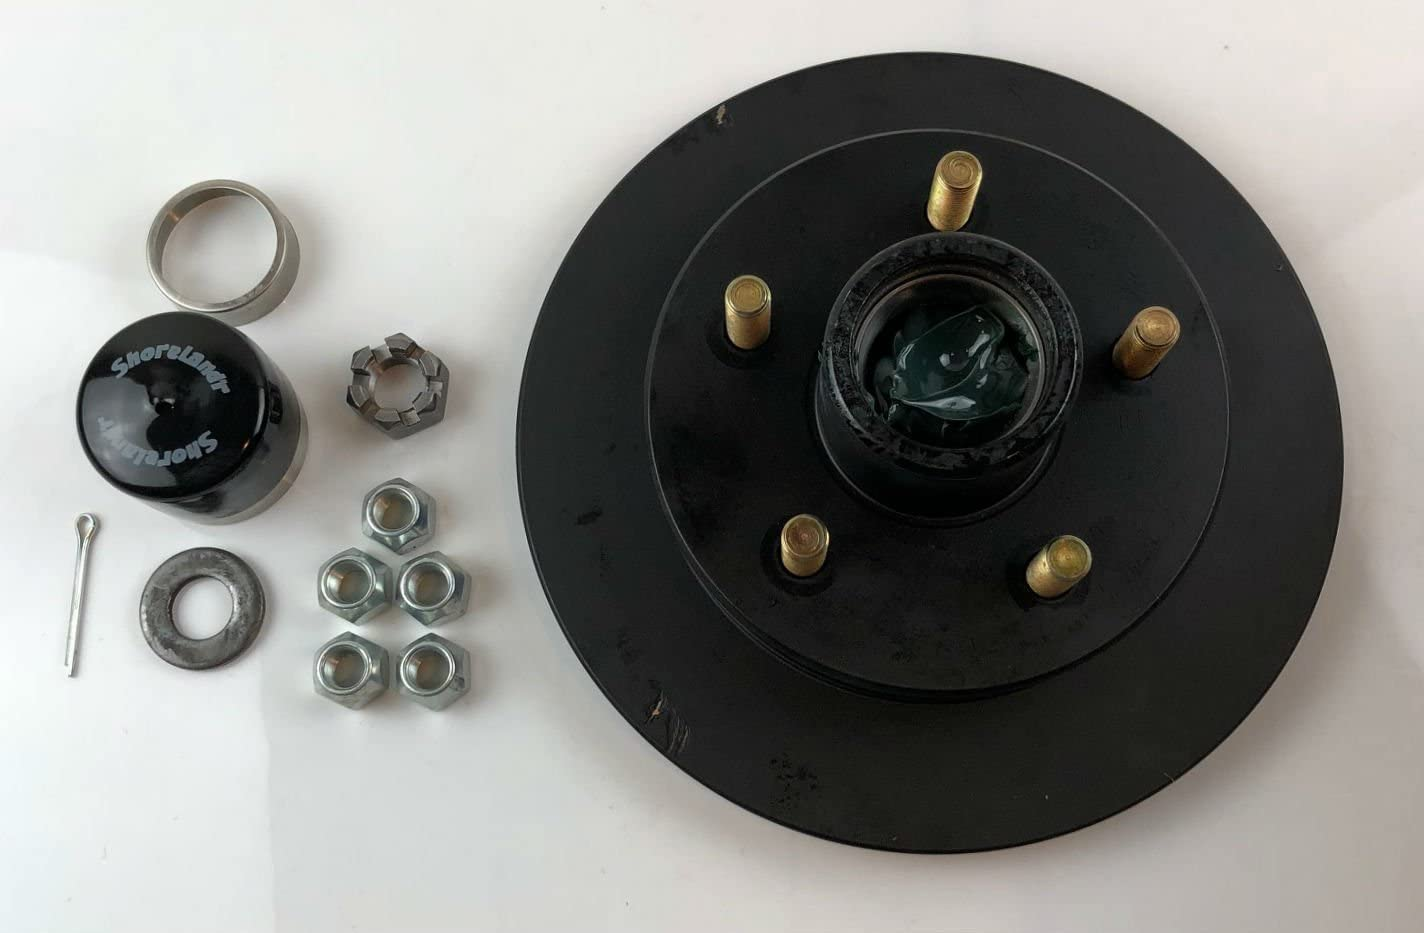 Shorelander SK0107 5 Bolt Hub - Vented Rotor Hardware 10 In Free shipping / New stock Disc